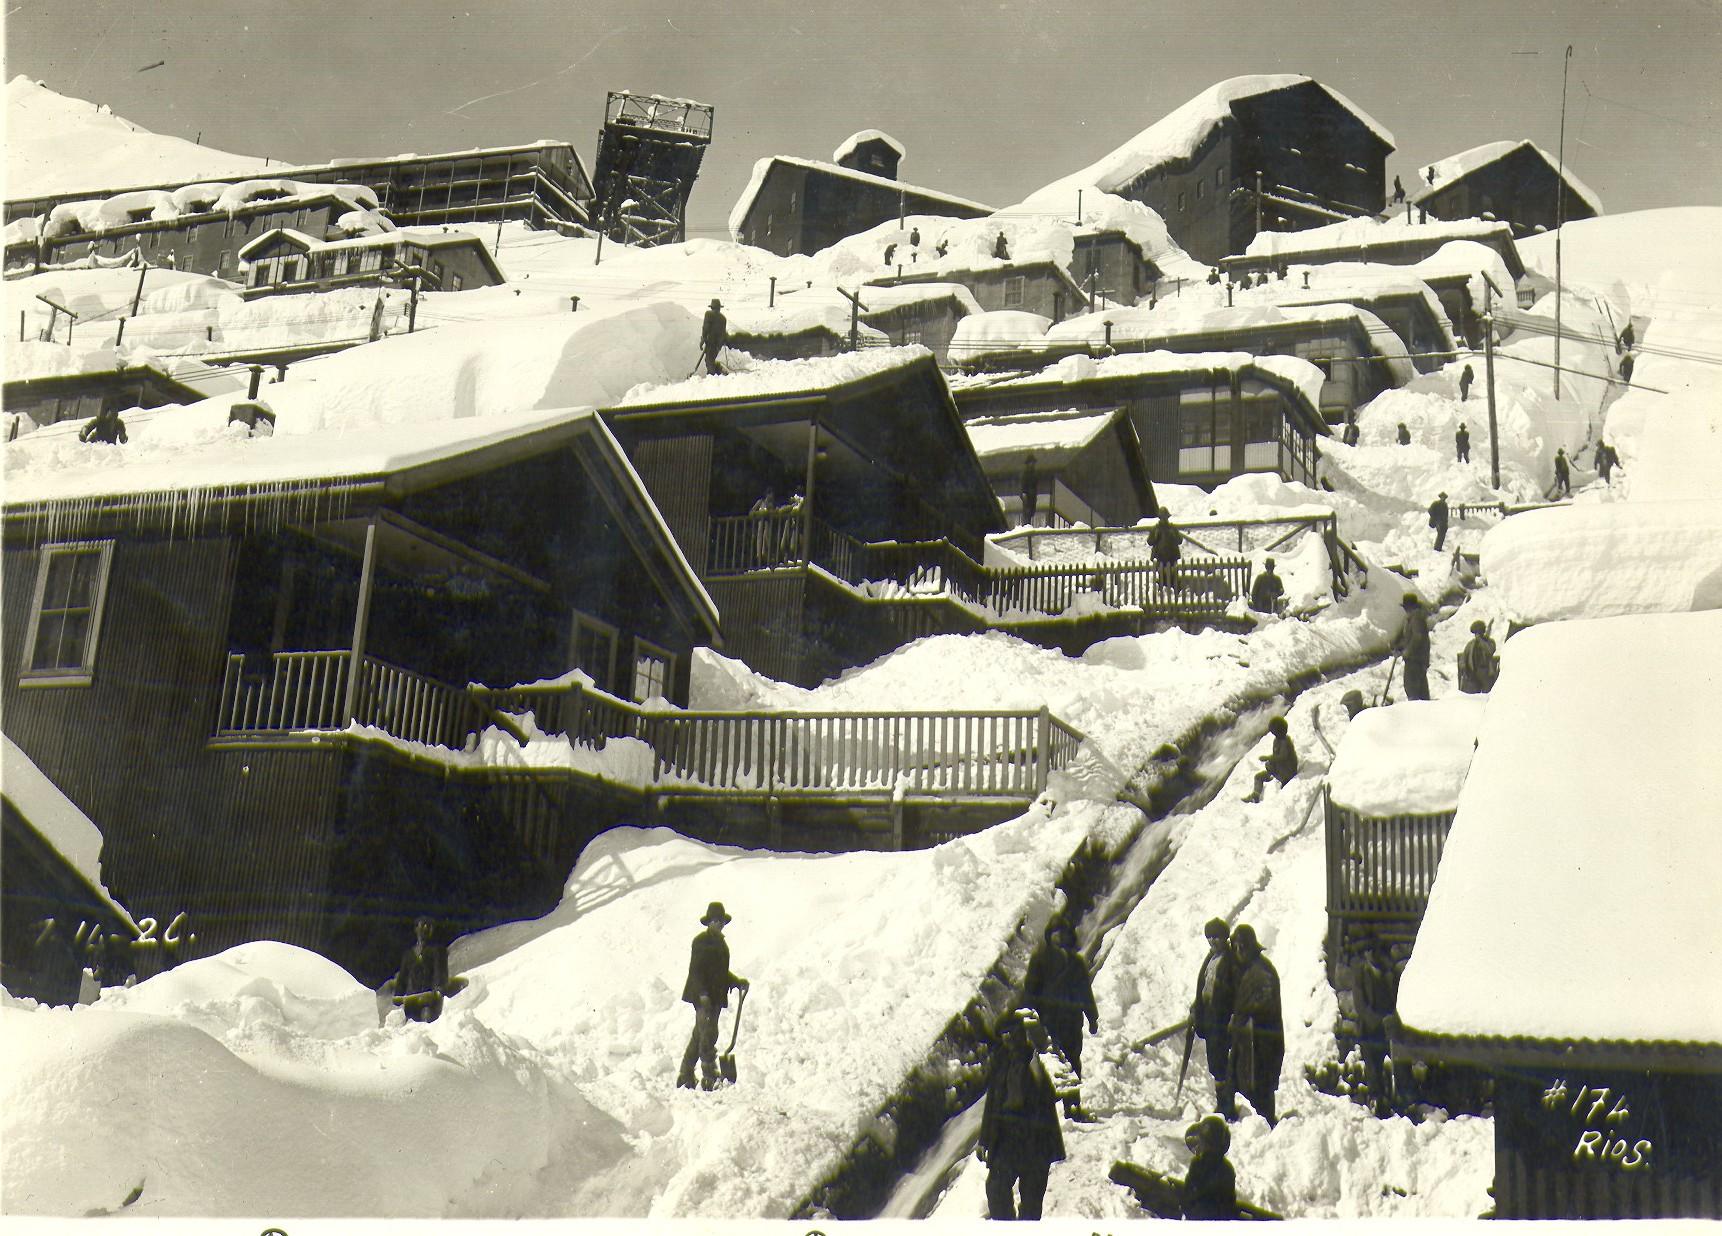 Enterreno - Fotos históricas de chile - fotos antiguas de Chile - Casa de Trabajadores Sewell, ca 1920